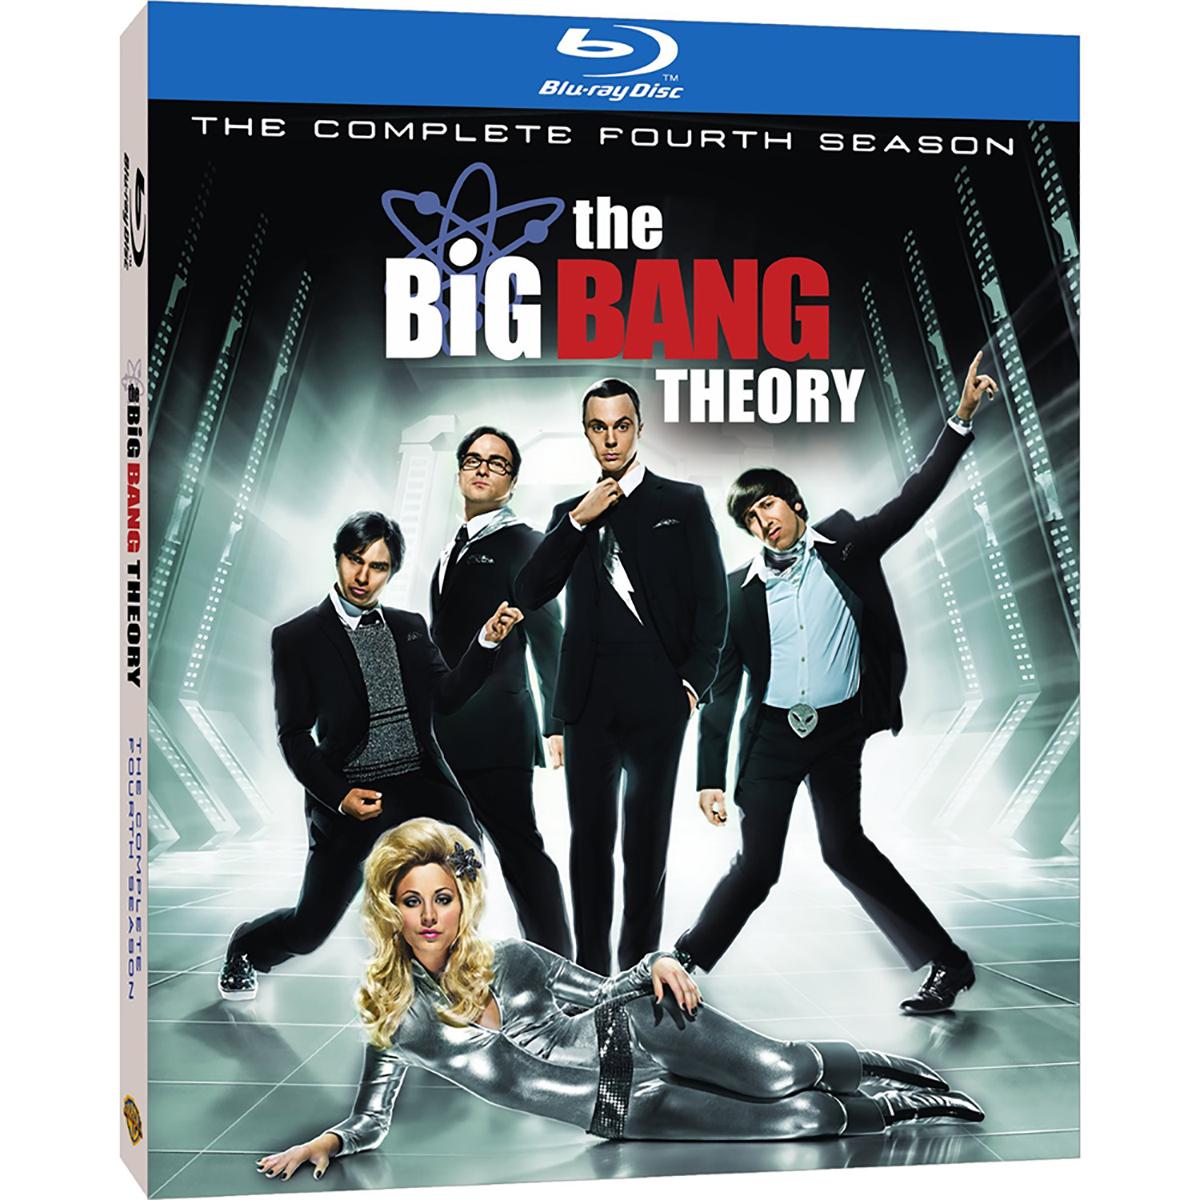 The Big Bang Theory: Season 4 Blu-ray -  DVDs & Videos 4334-363762